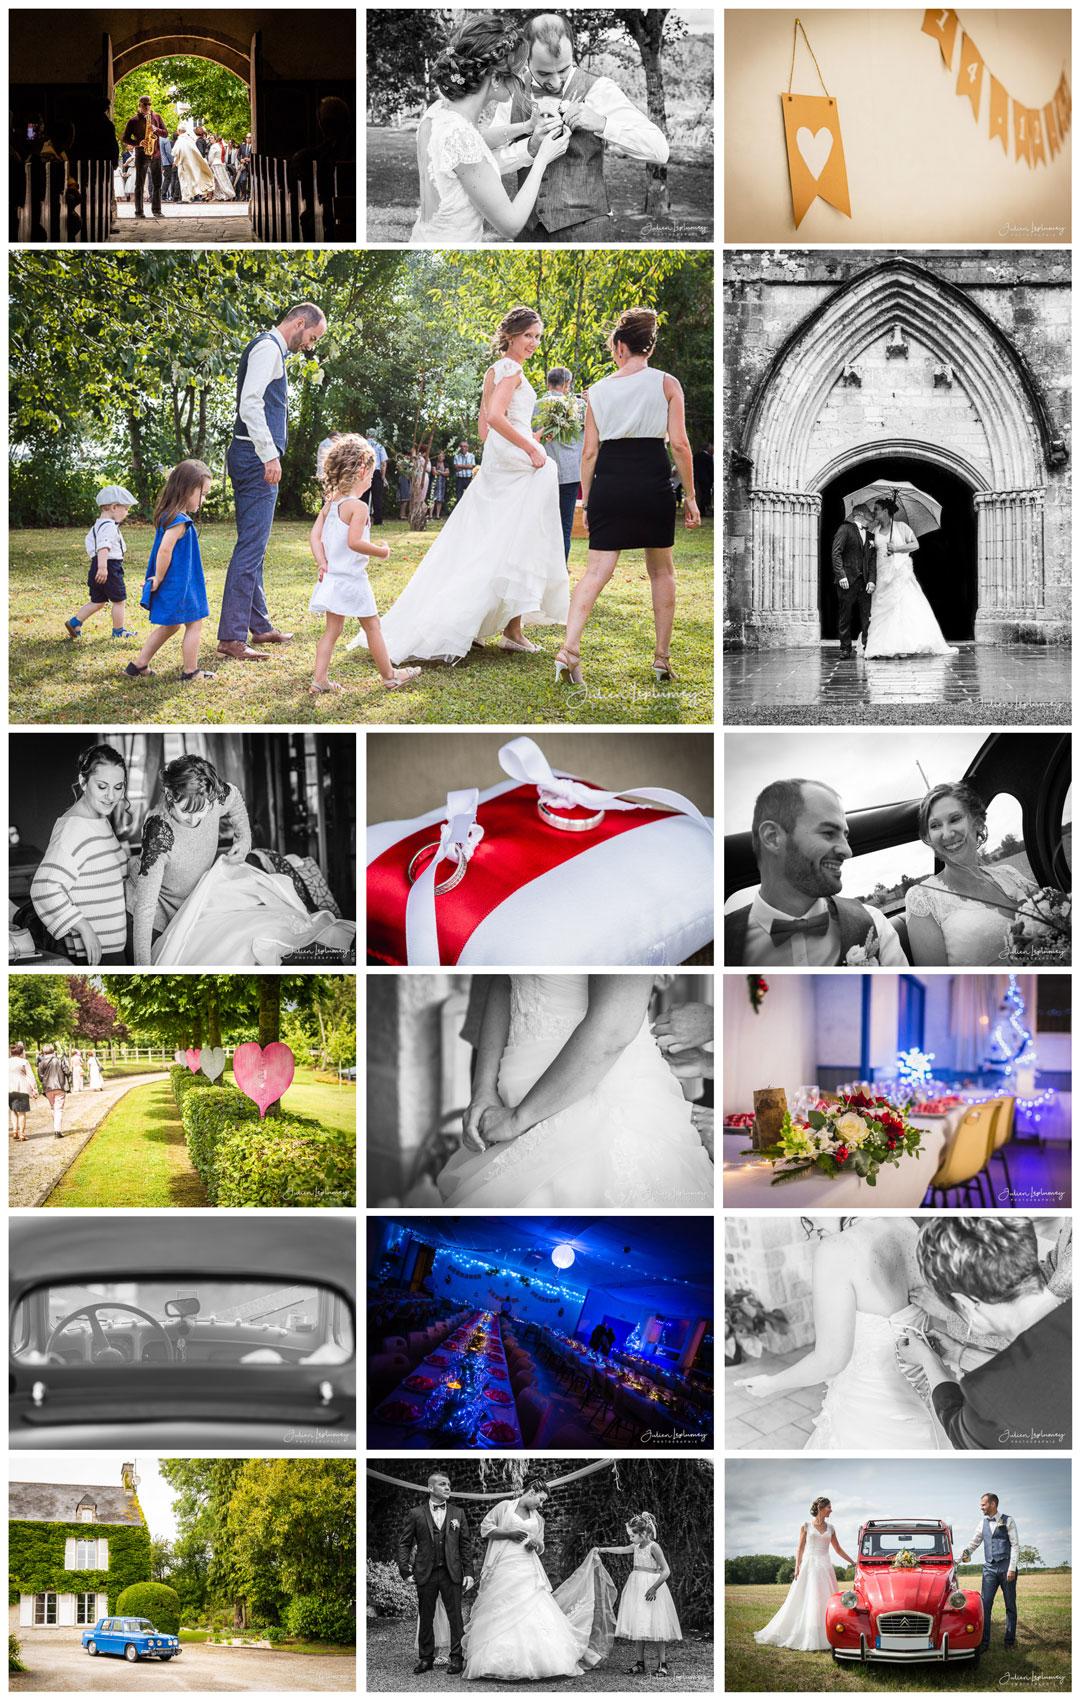 photographe-mariage-cherbourg-normandie-manche-cotentin